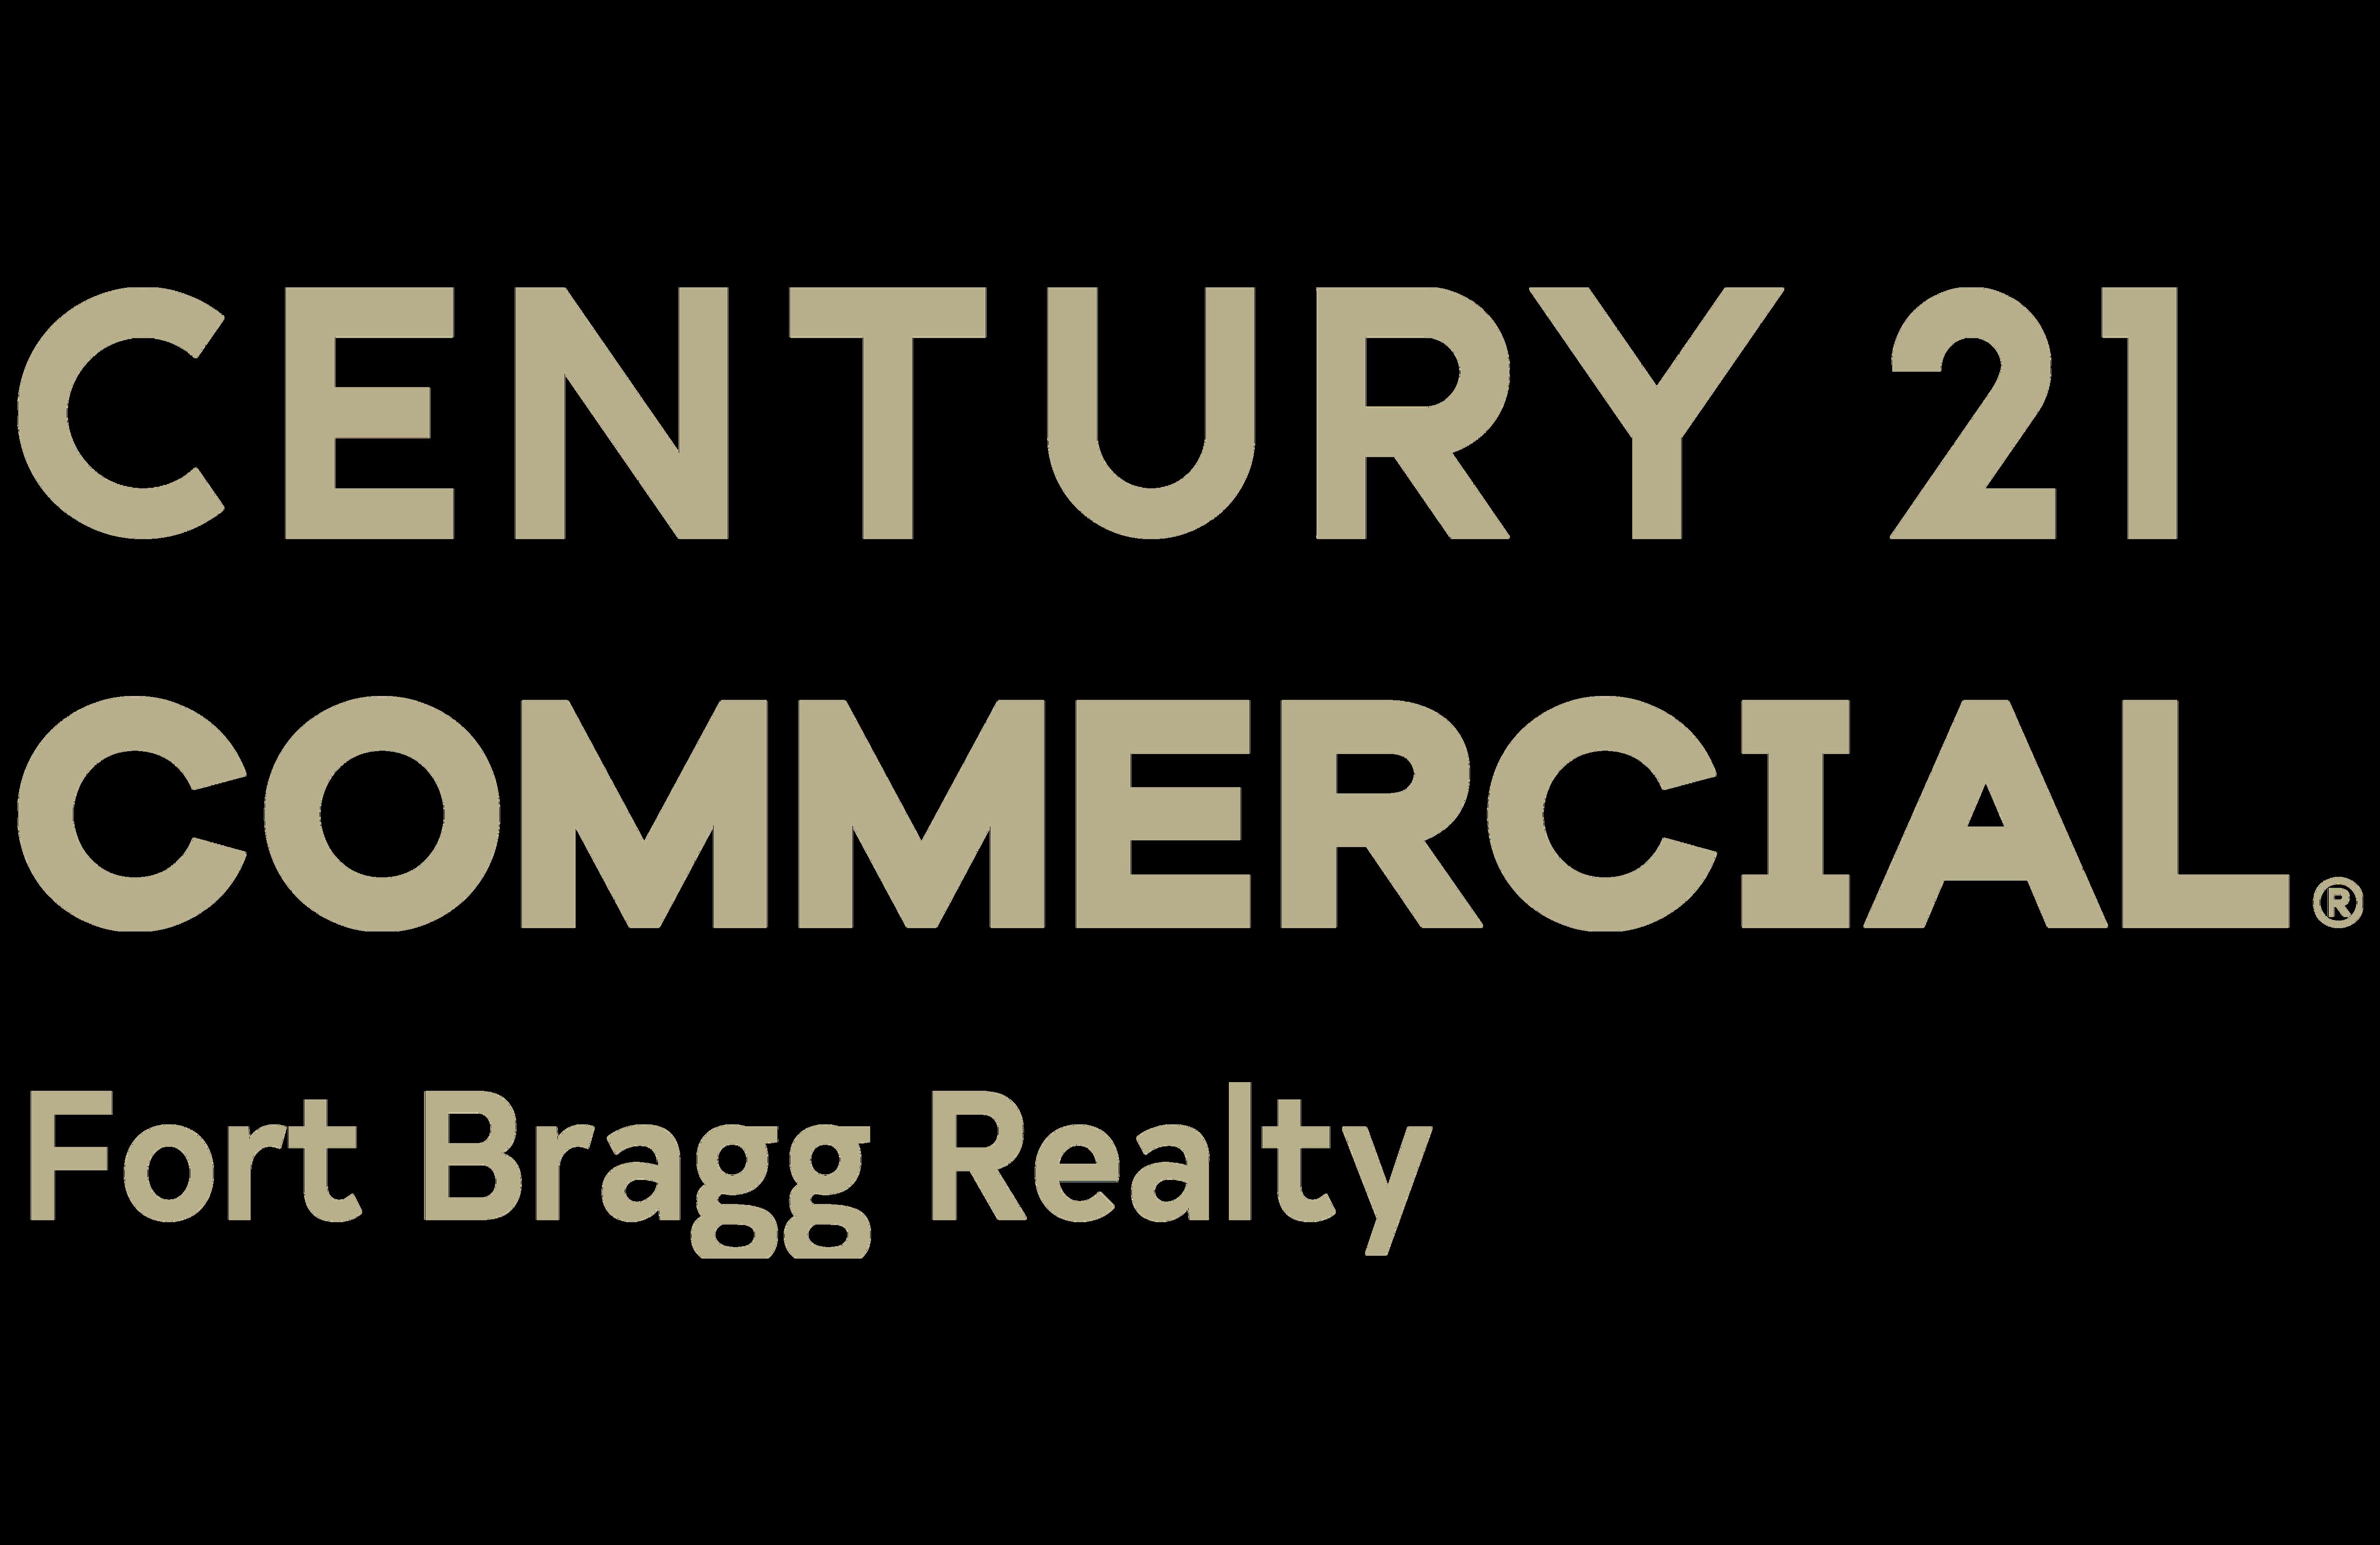 Paul Clark 9642121 of CENTURY 21 Fort Bragg Realty logo